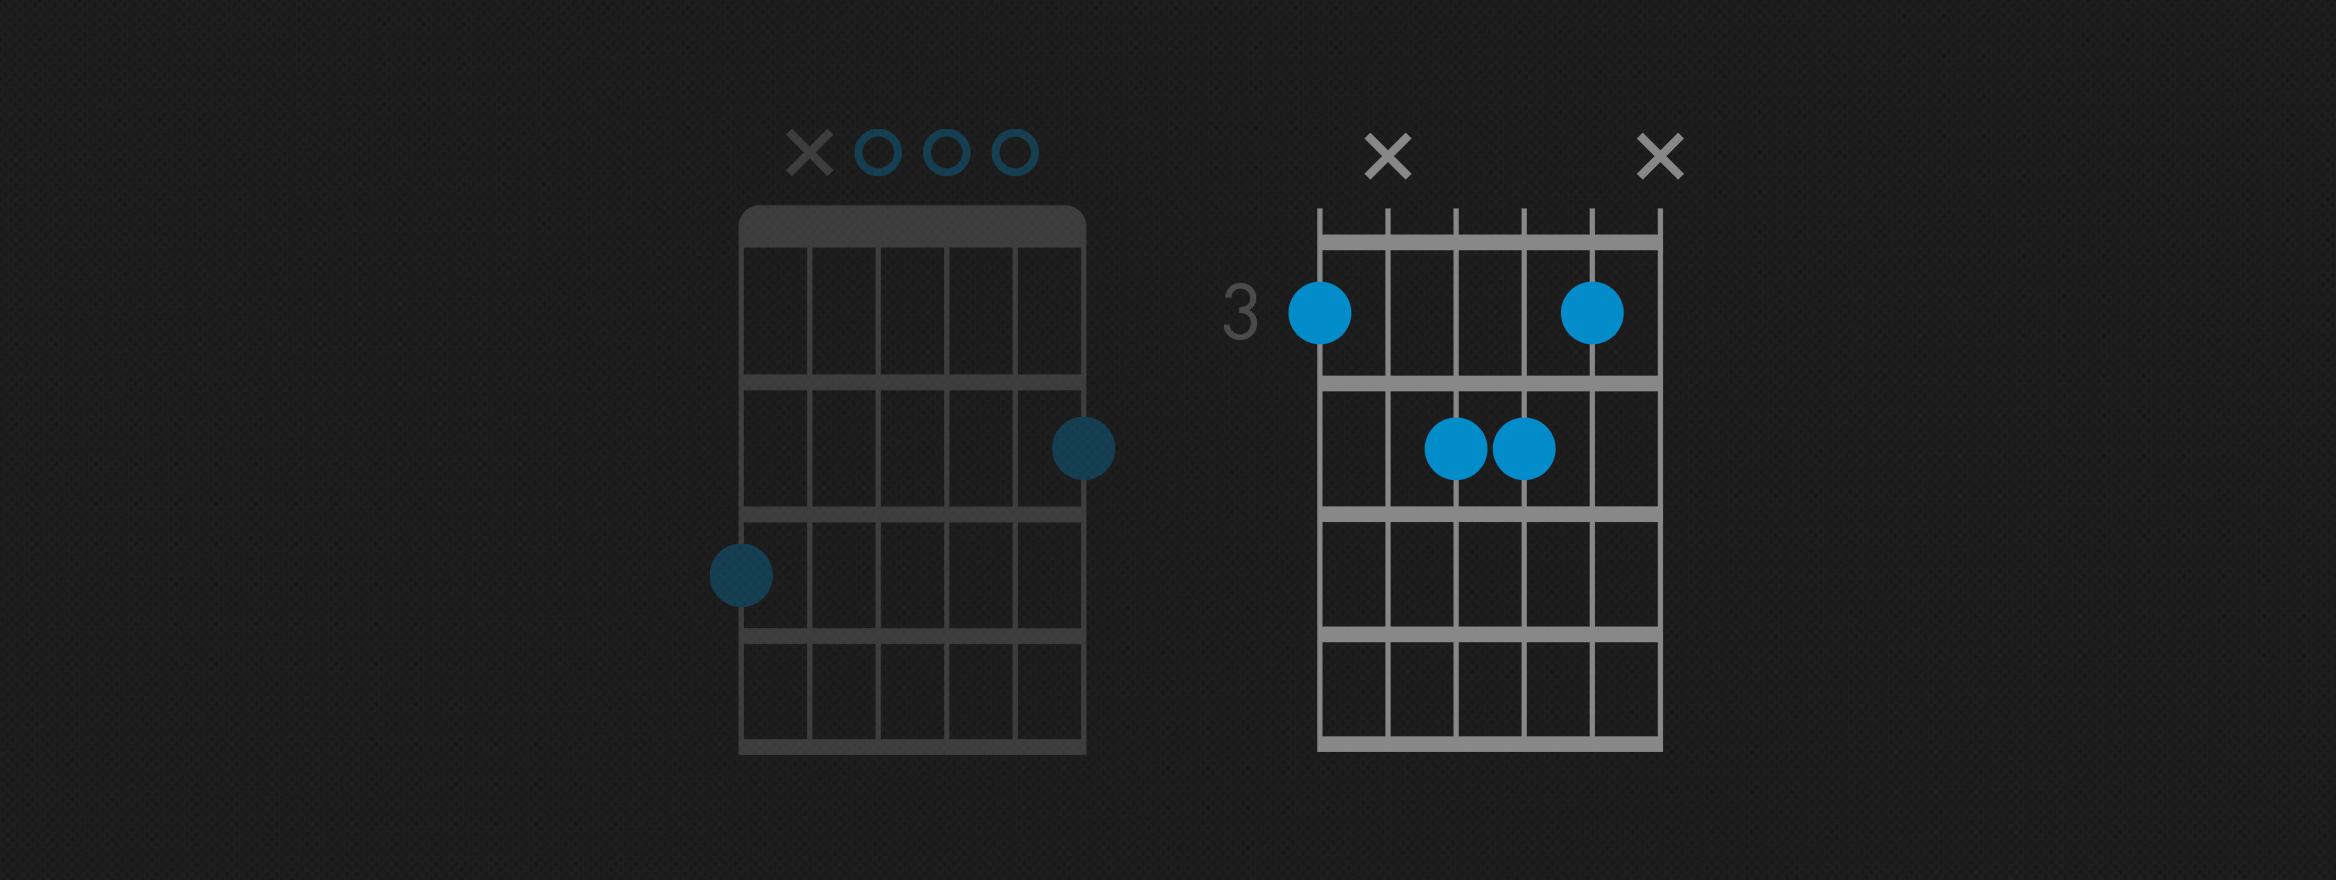 How to Play G Major 15th Guitar Chord   Gmaj15 Chord   Fender Play